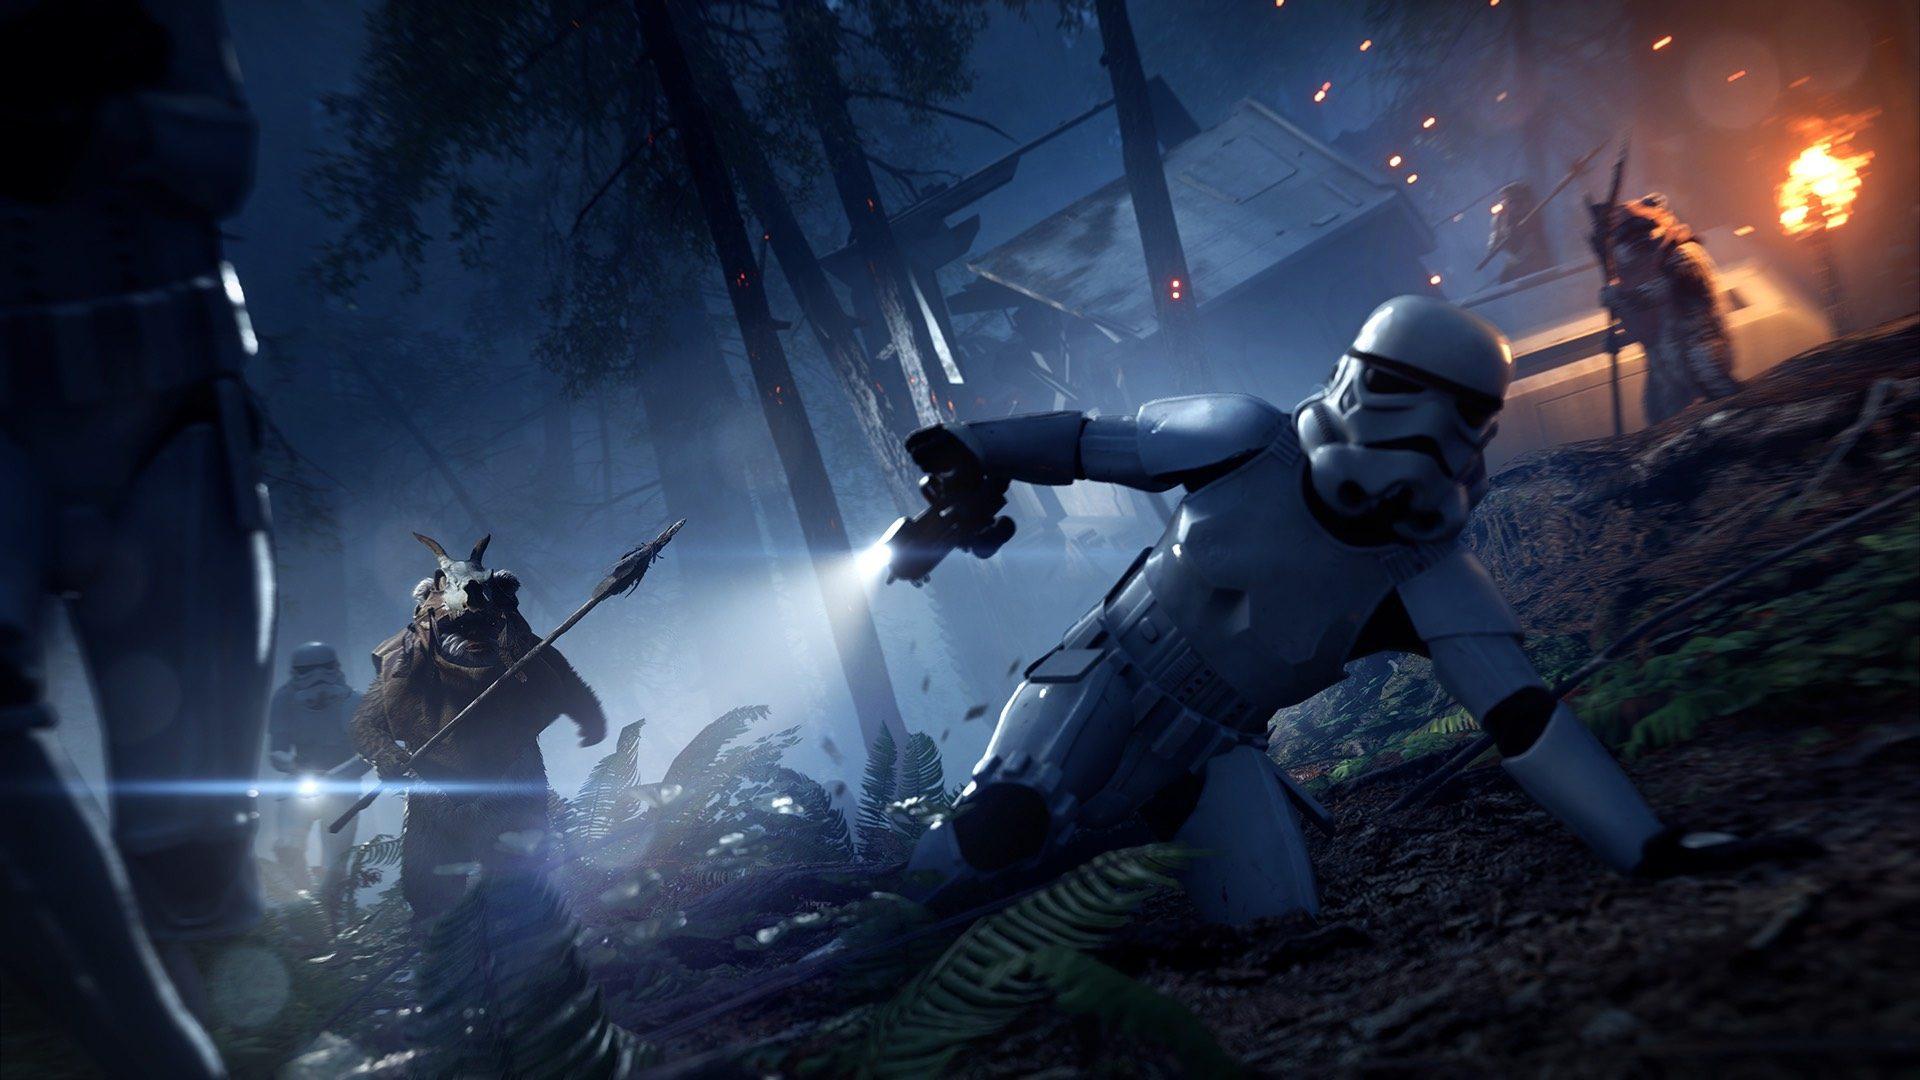 star wars battlefront 2 night on endor polowanie na ewoki